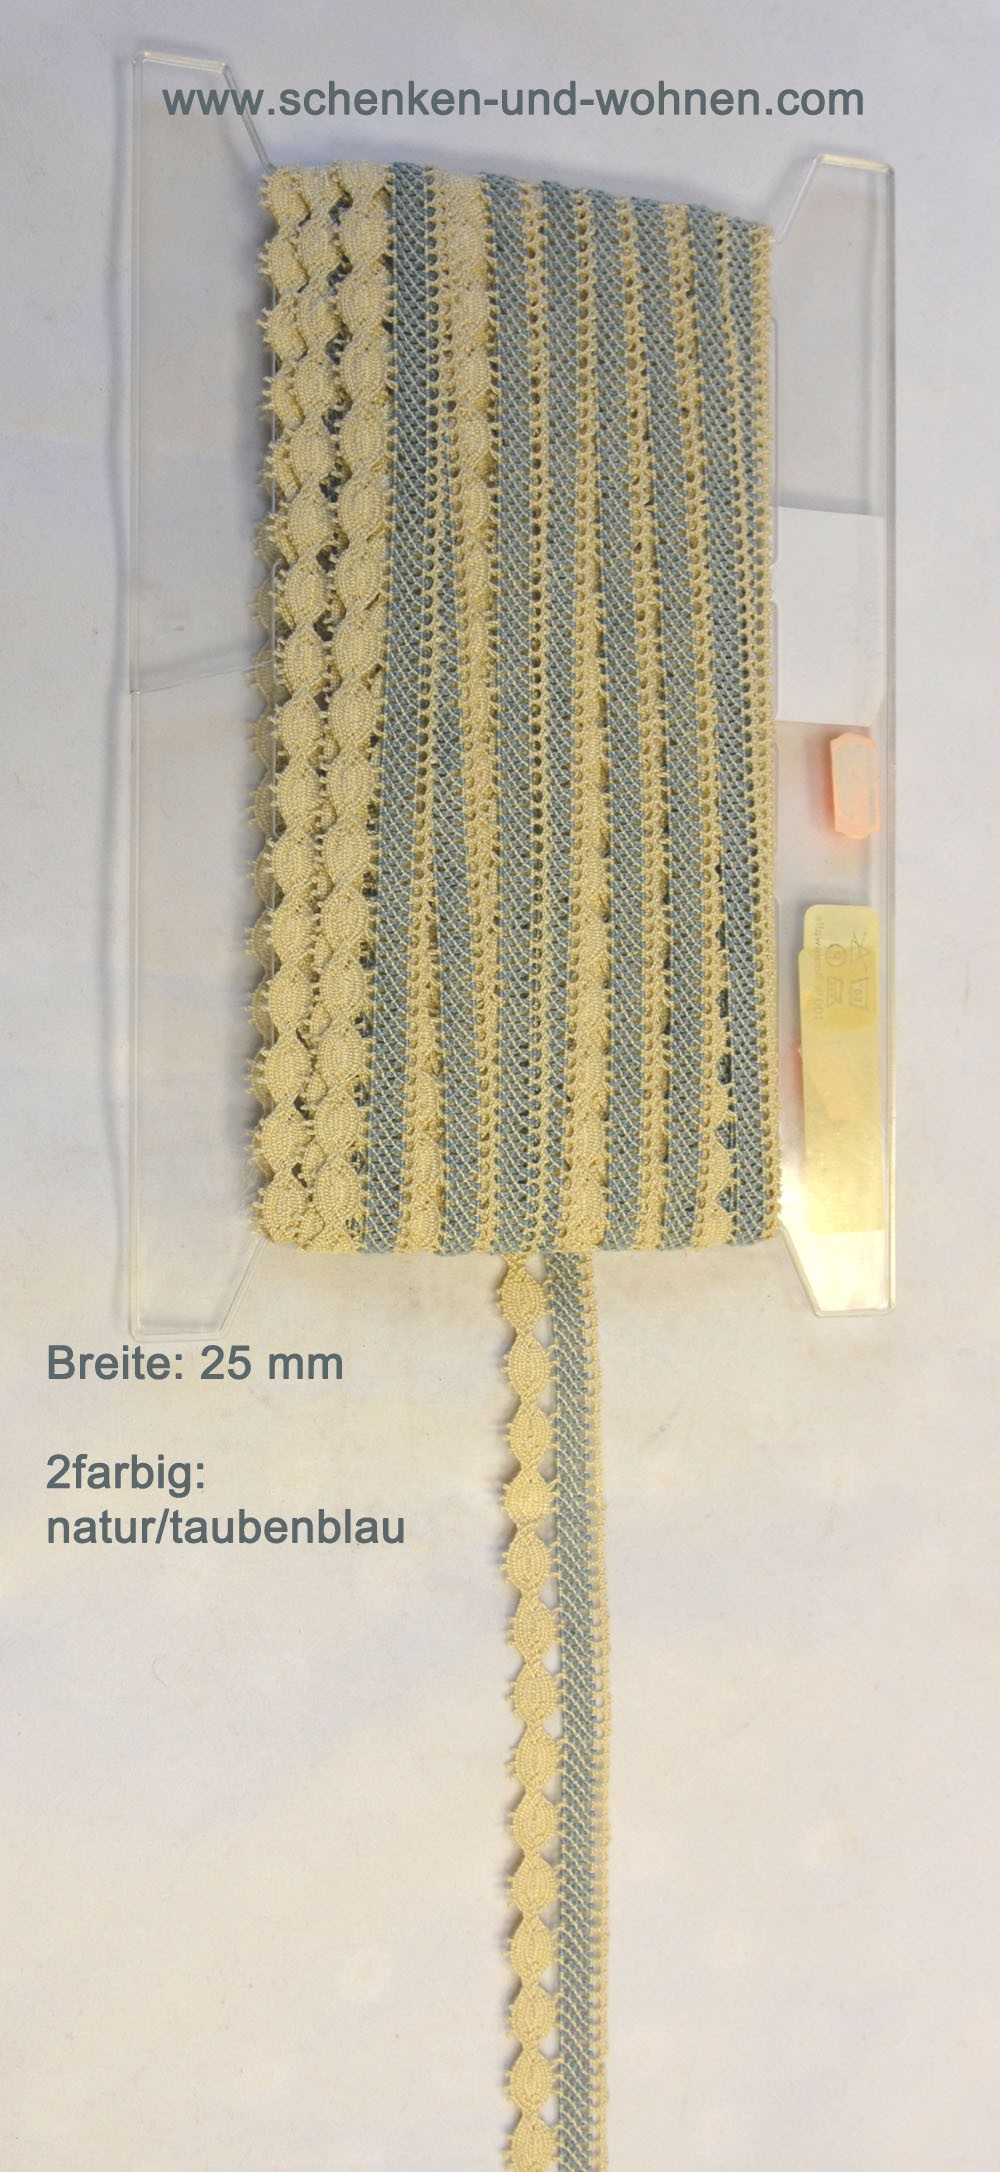 Baumwoll-Spitze Borte 25 mm breit 2farbig natur-taubenblau